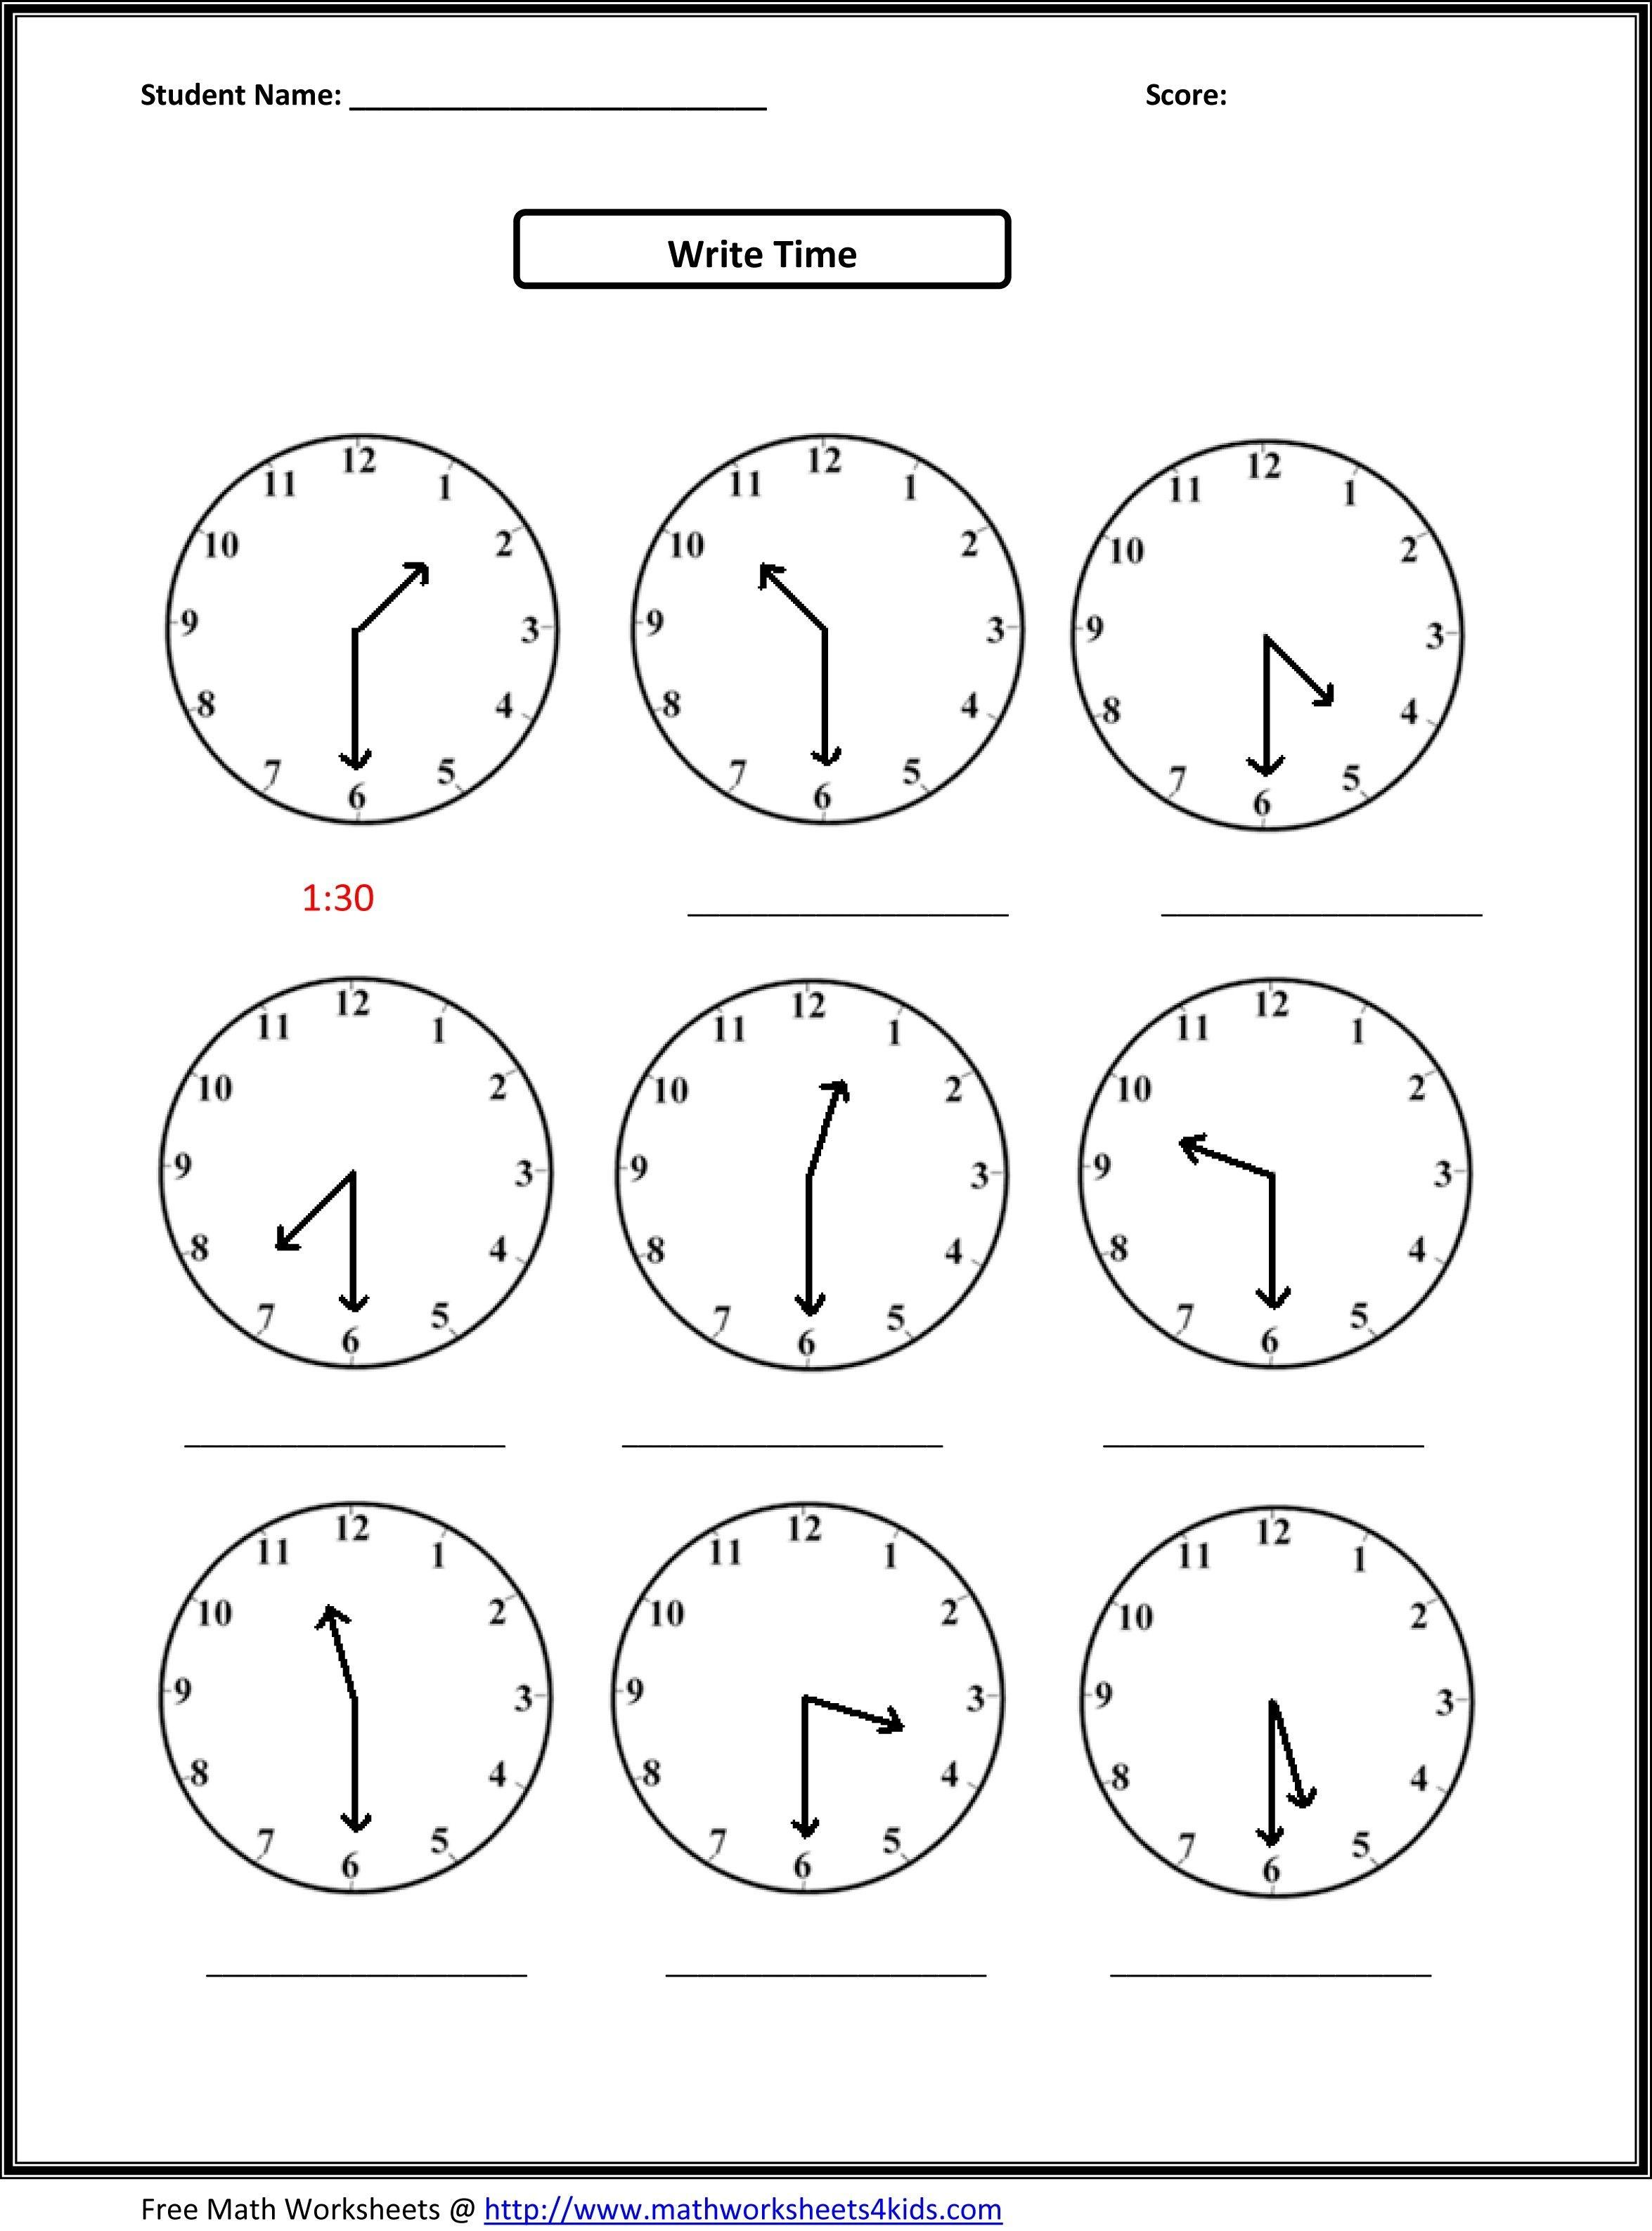 2Nd Grade Free Worksheets Math   Math: Time/measurement   2Nd Grade - Free Printable Second Grade Worksheets